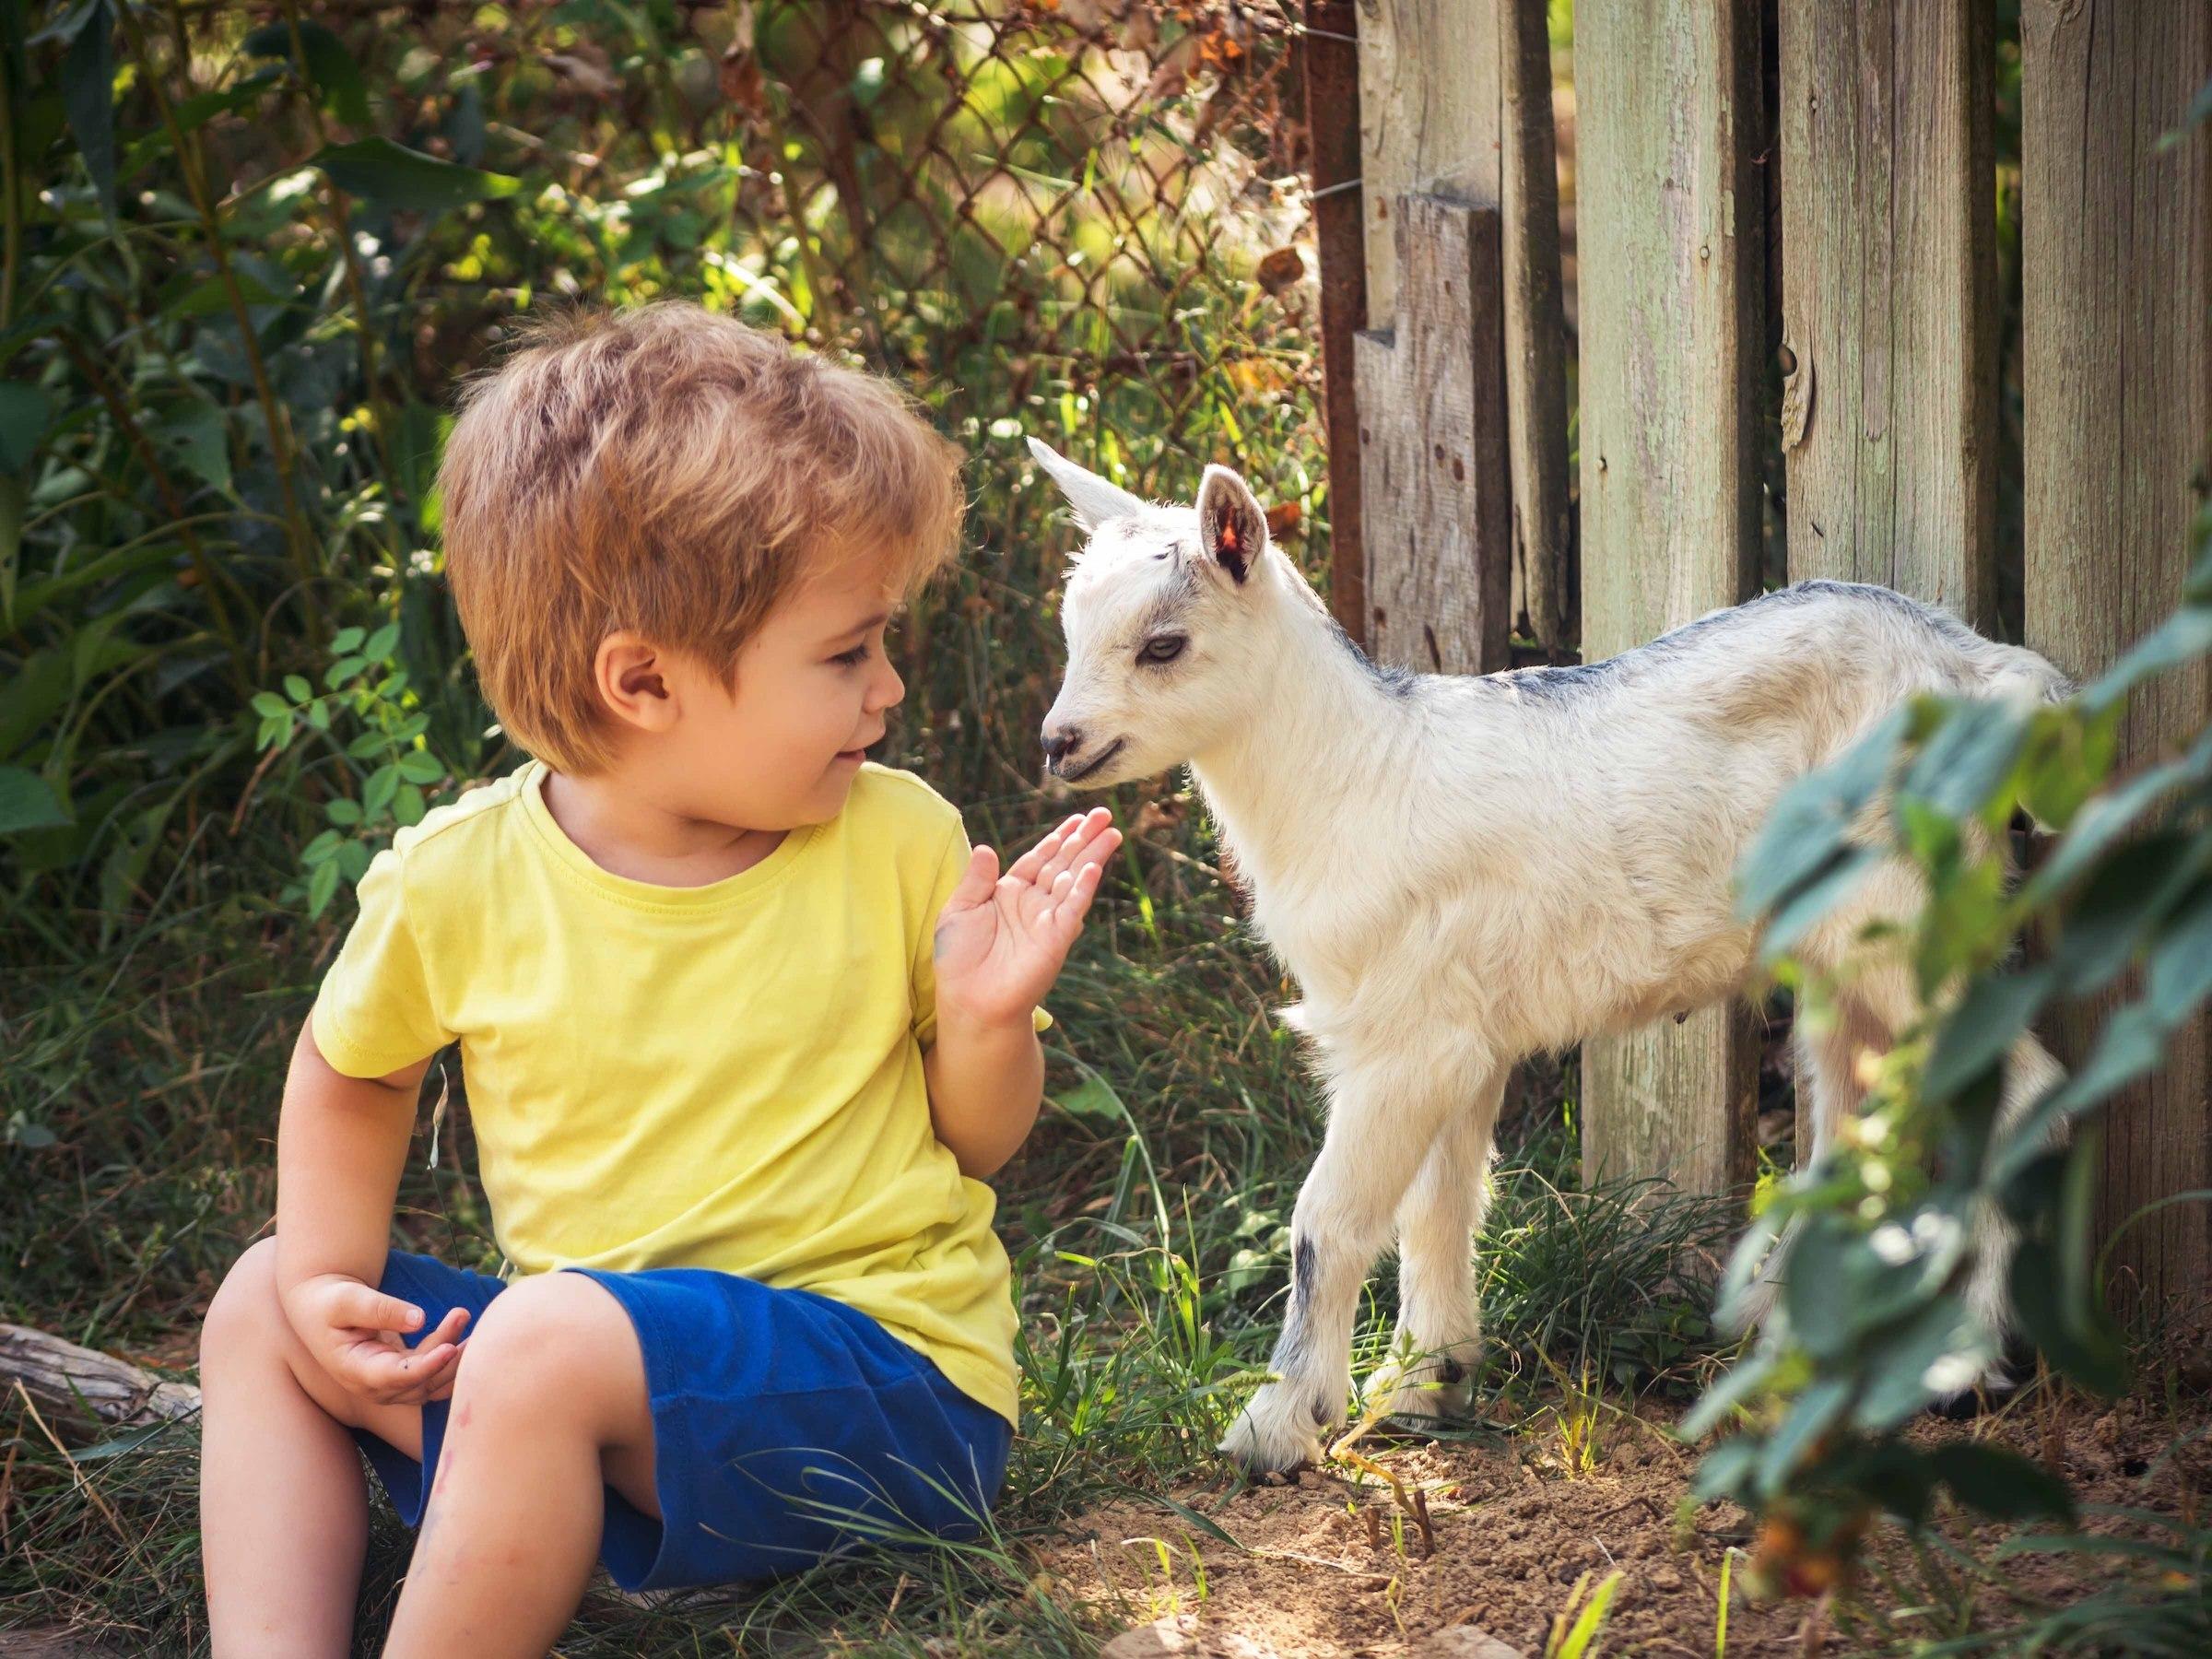 Petting Zoo Goat Kids